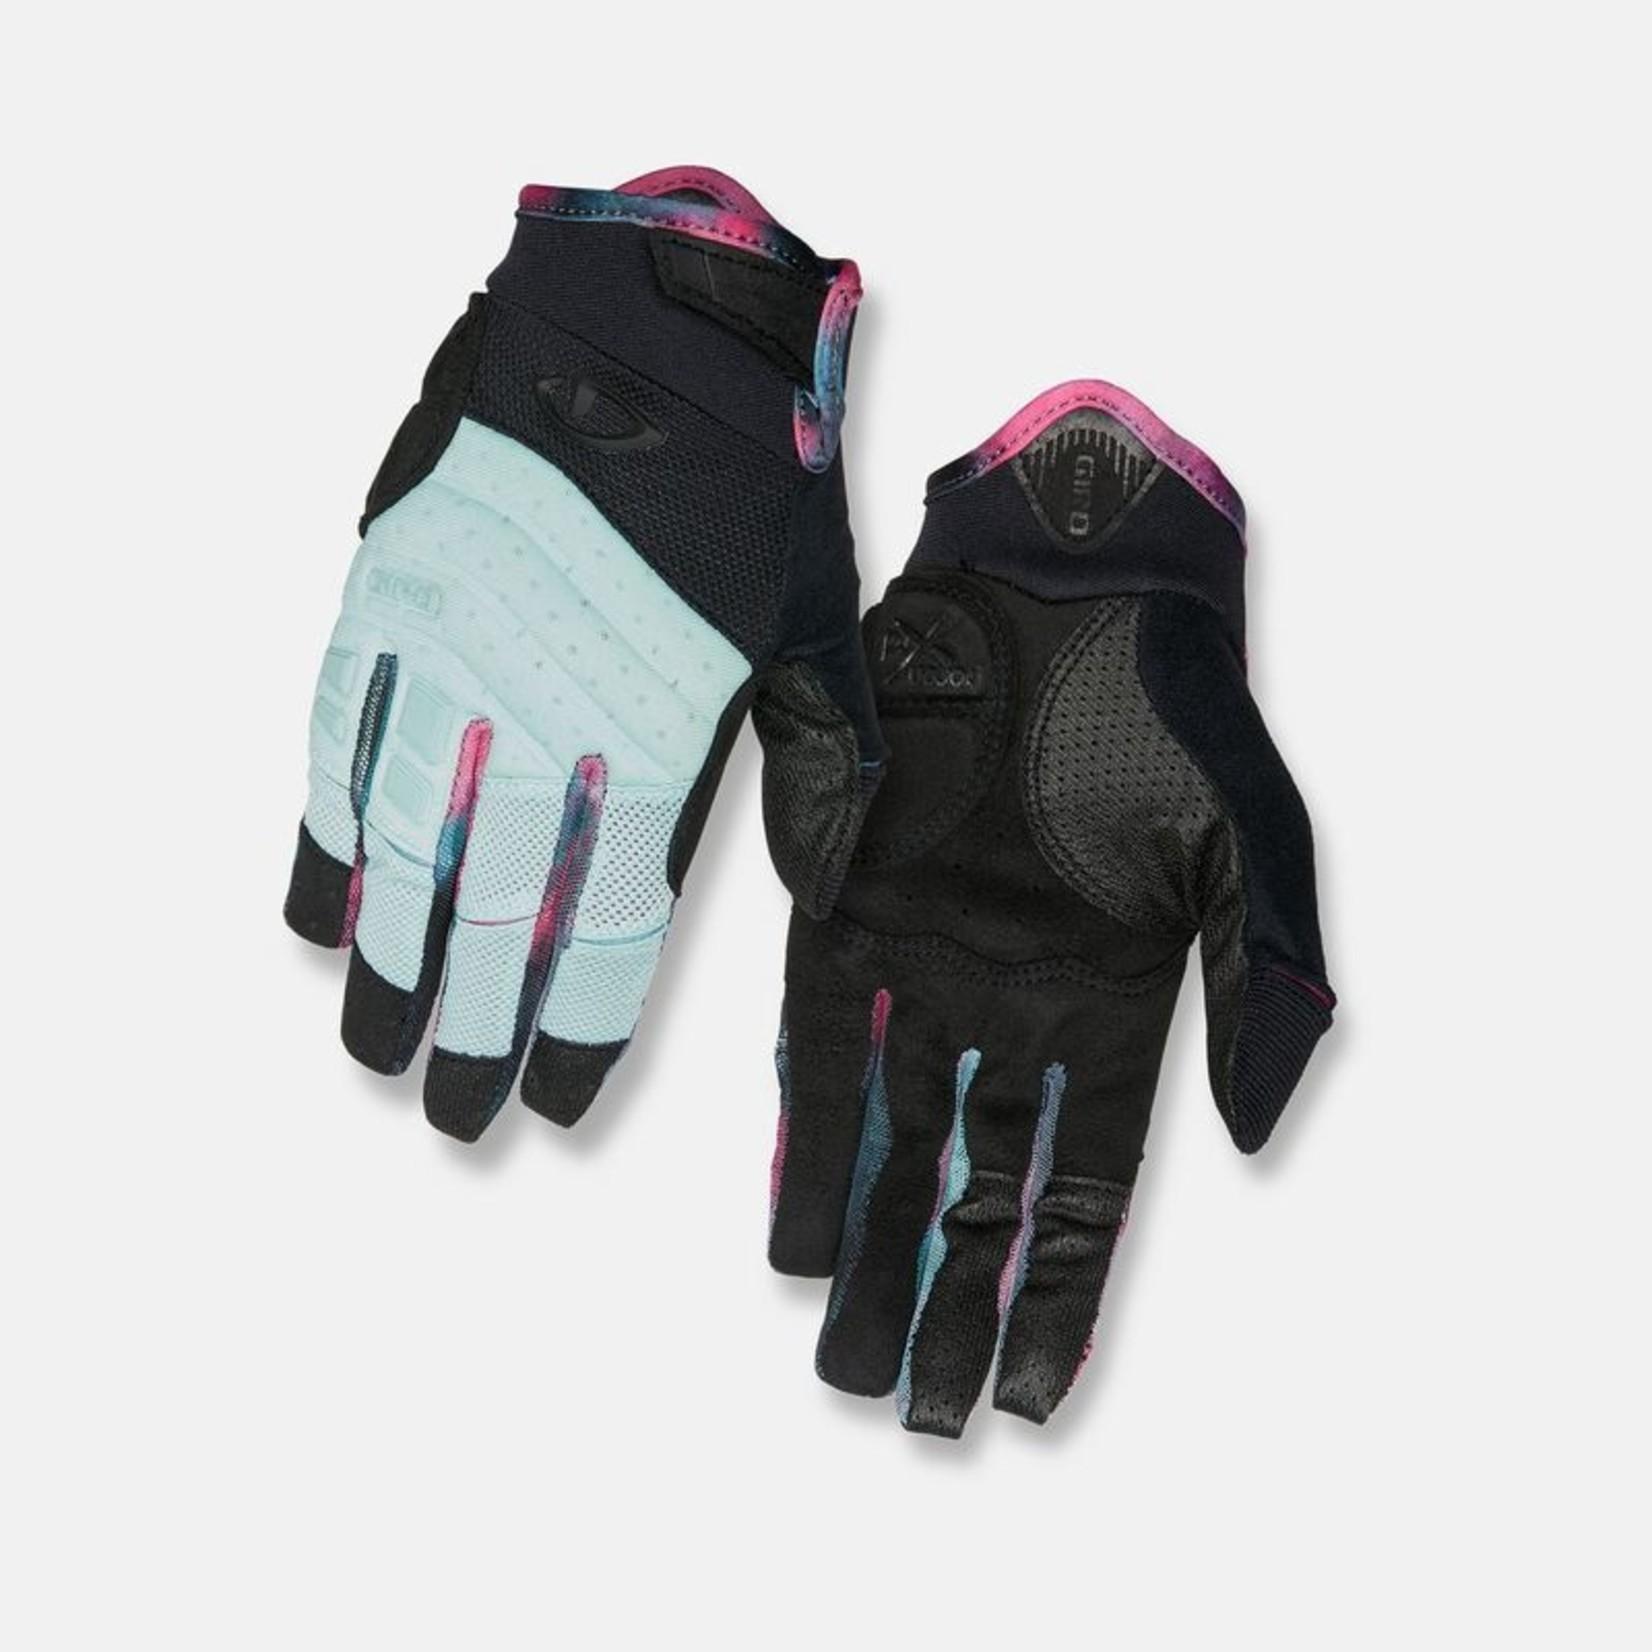 Giro Giro Gloves - Xena